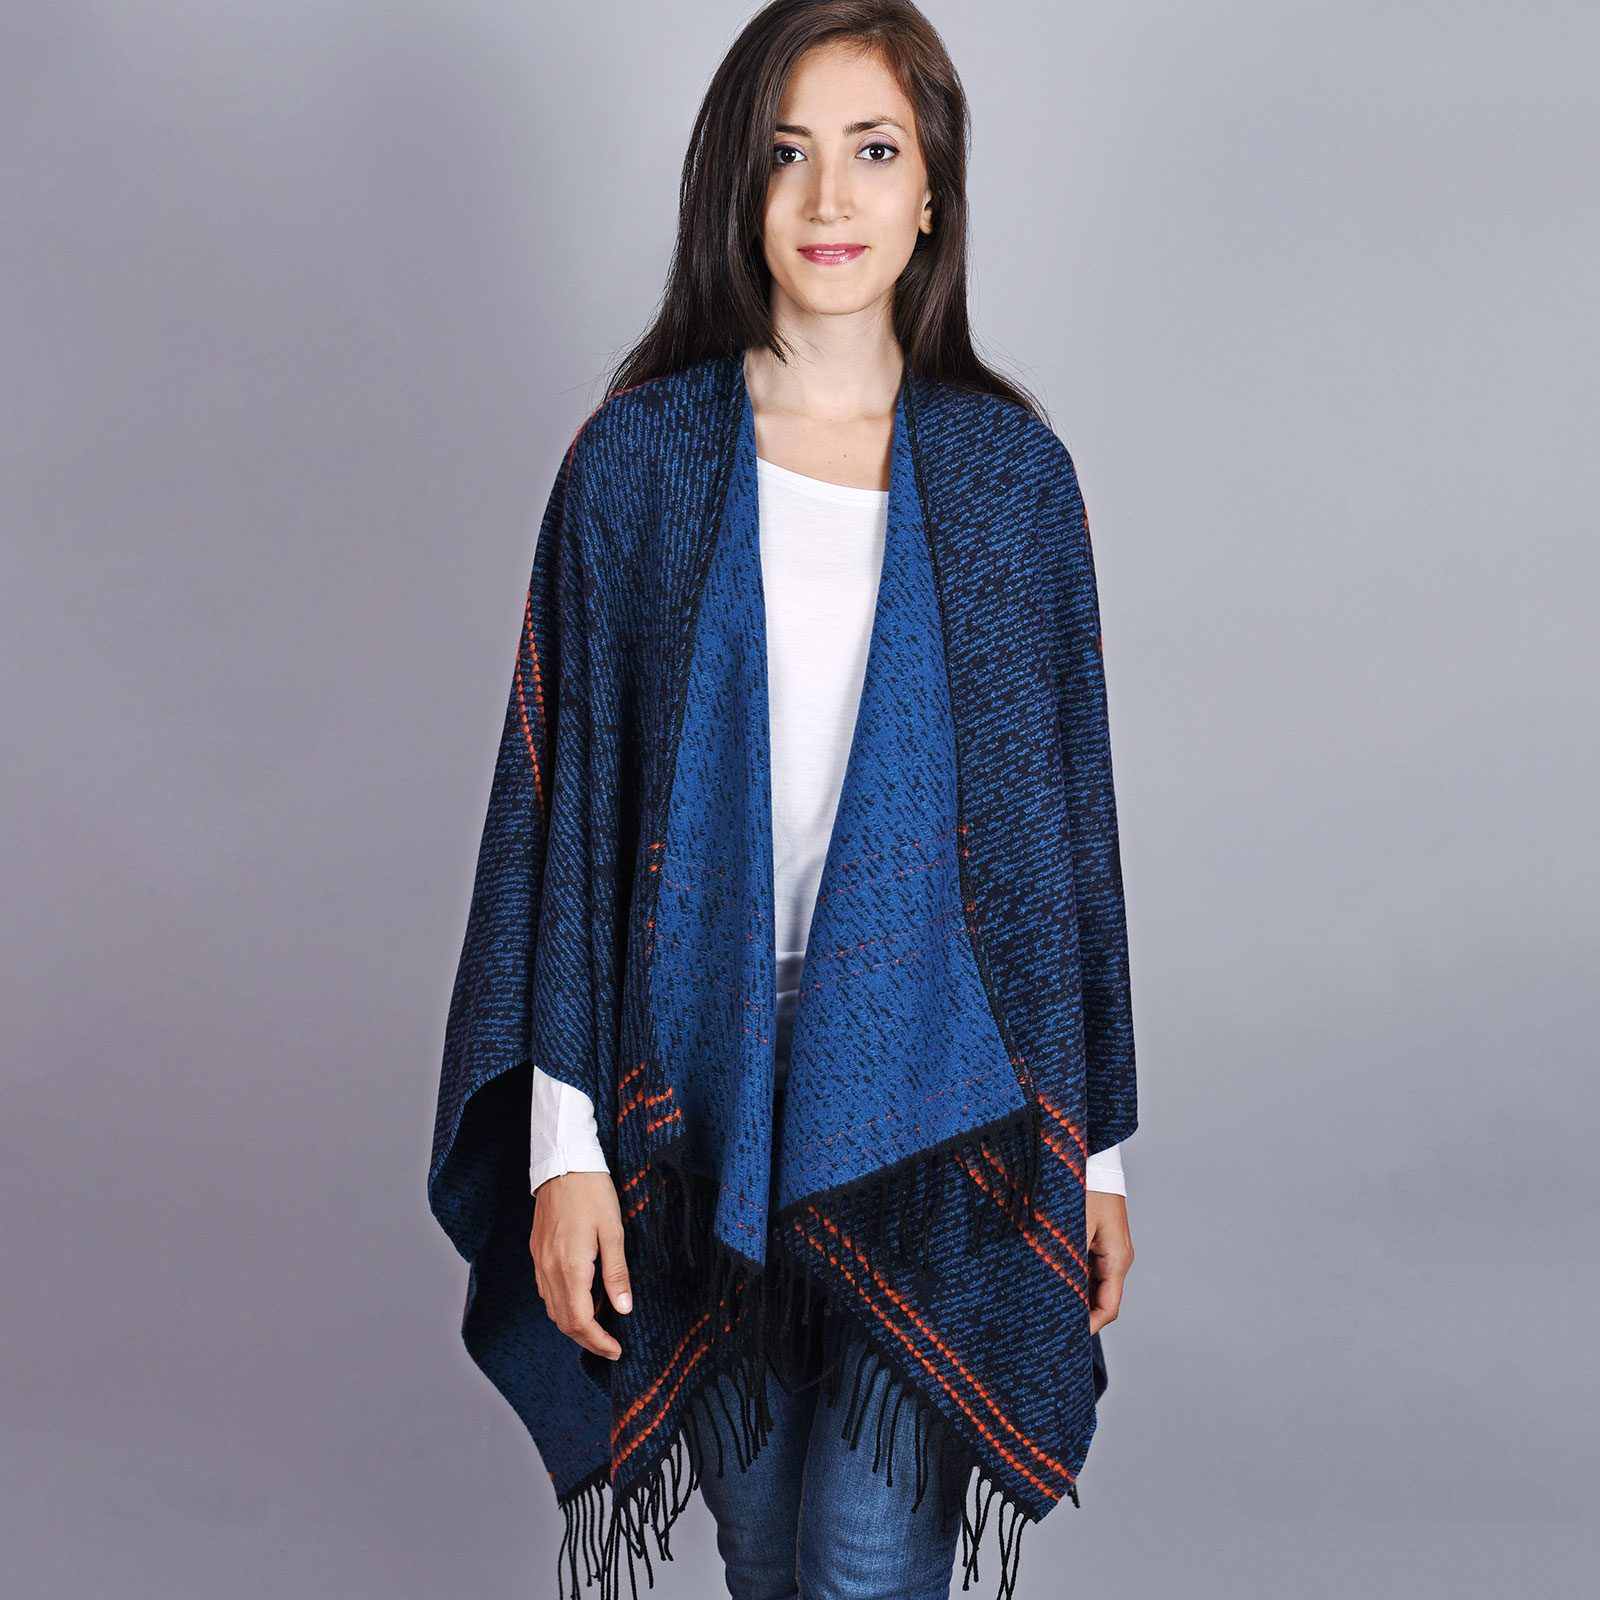 http://lookbook.allee-du-foulard.fr/wp-content/uploads/2019/01/AT-04507-VF16-1-poncho-femme-bleu-marine-1600x1600.jpg